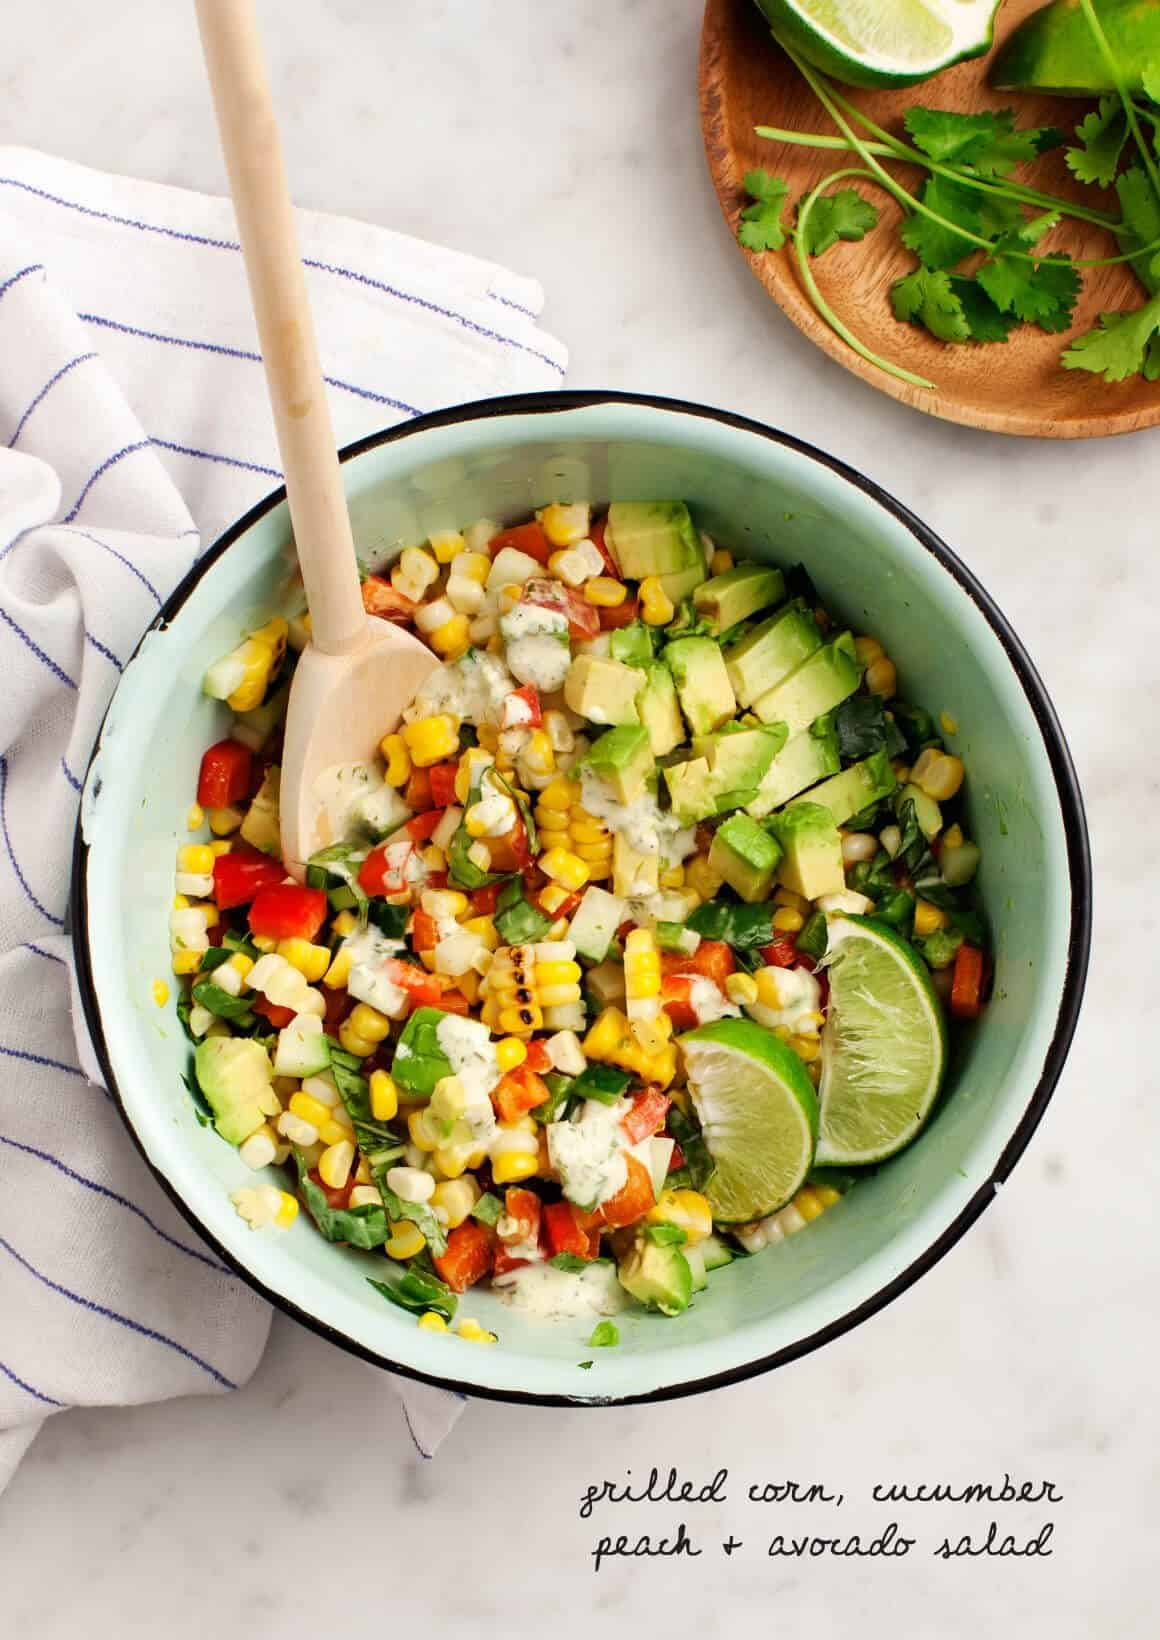 Corn, Cucumber, Peach & Avocado Salad